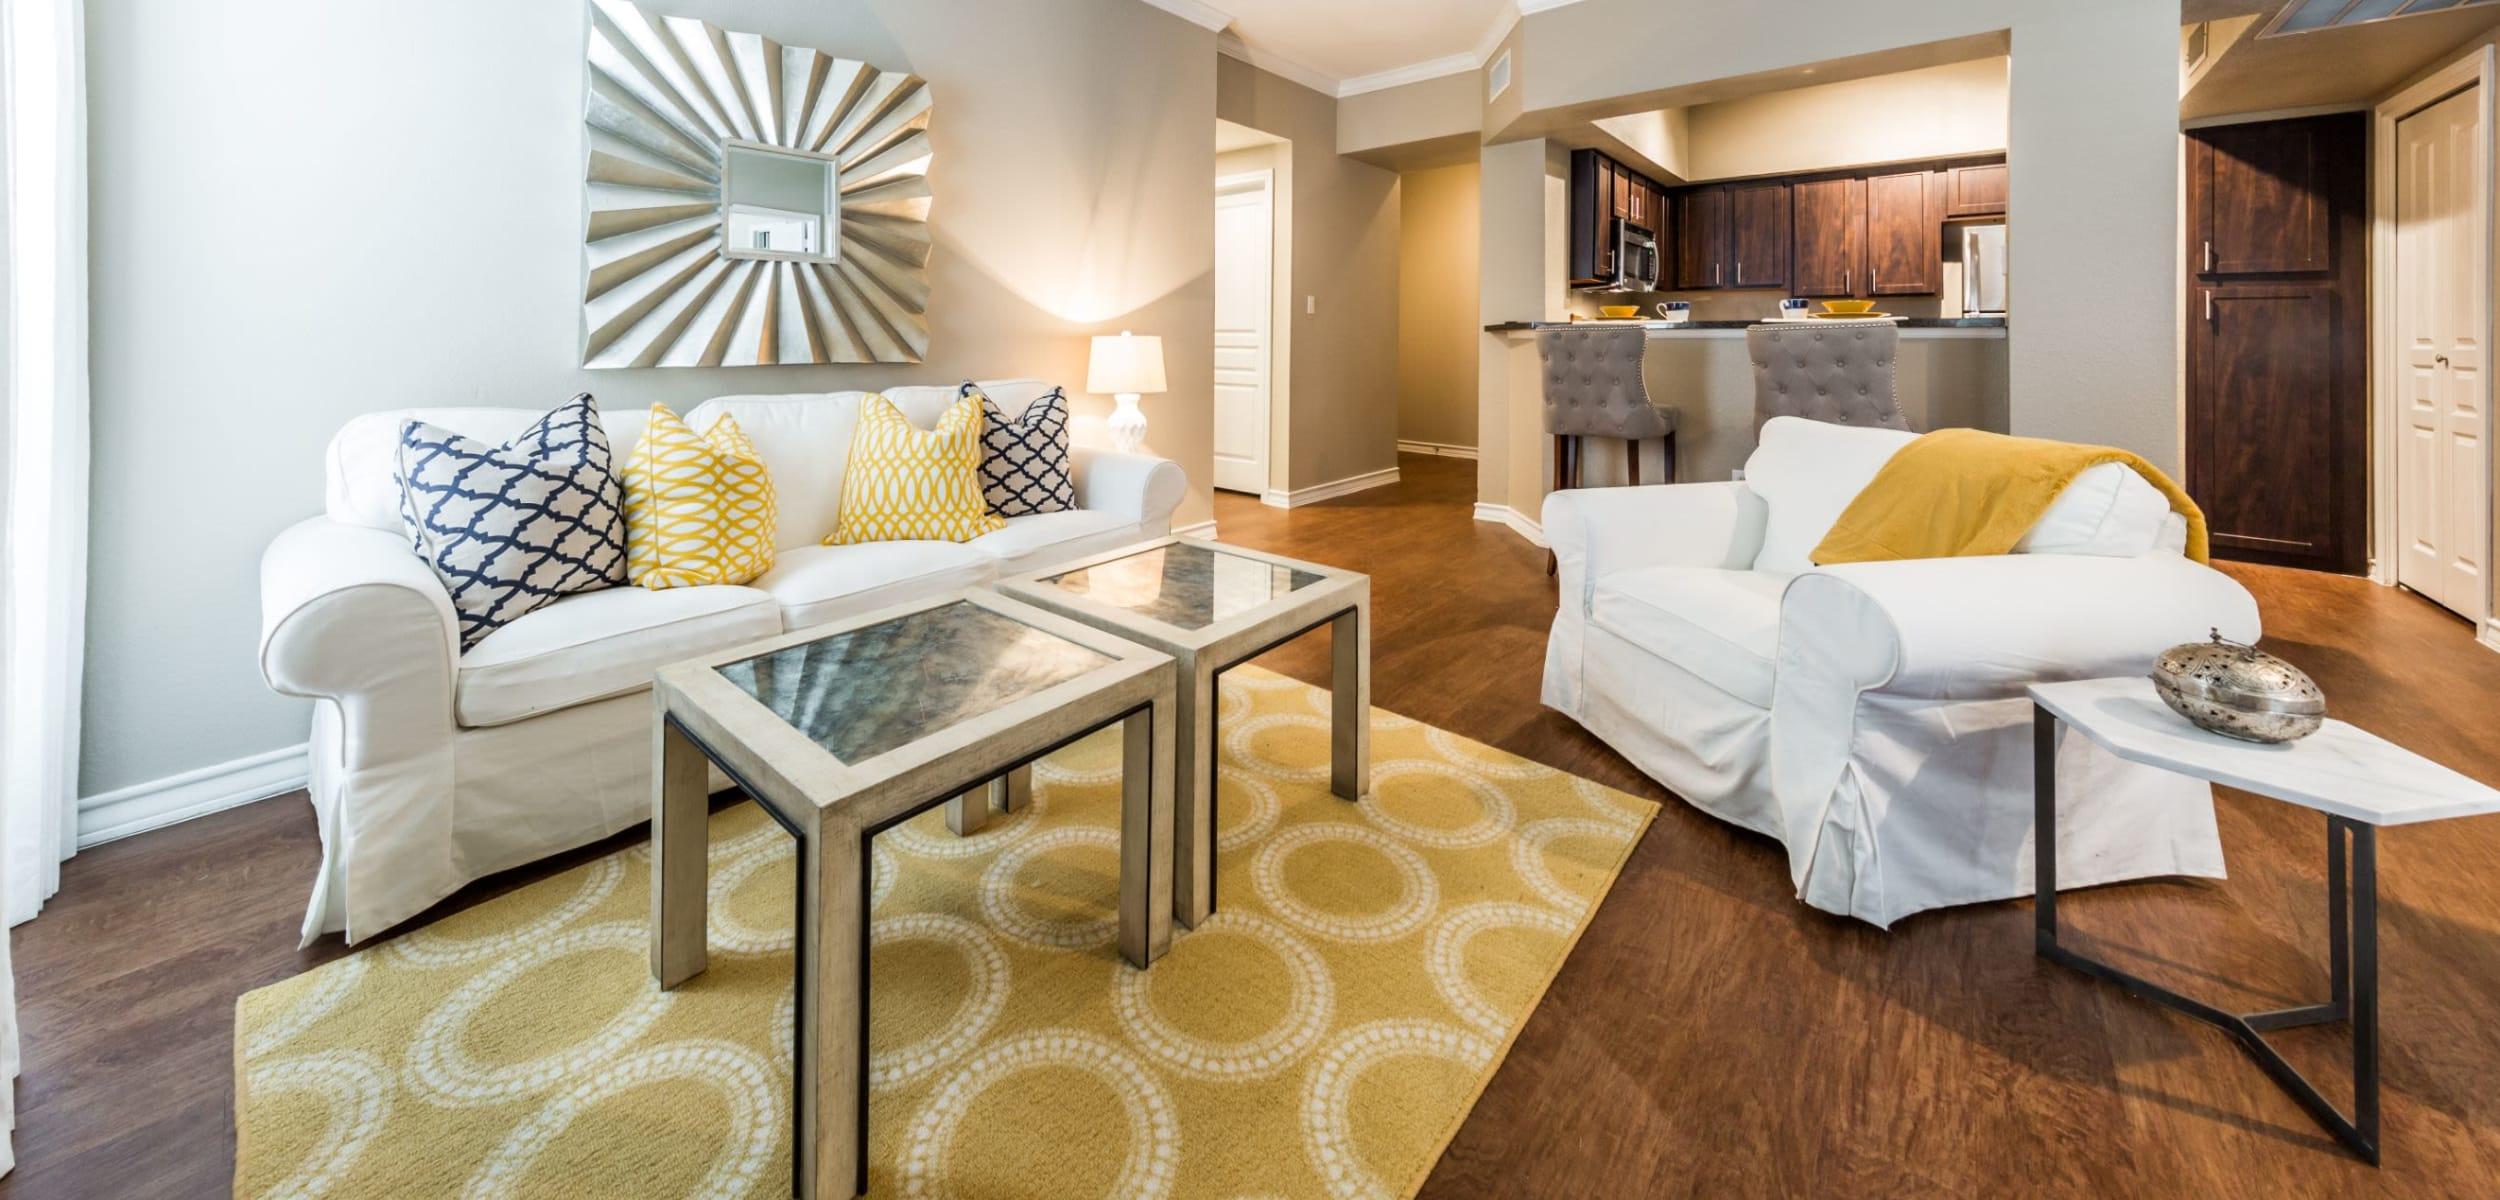 Living room with wood style floors at Marquis at Deerfield in San Antonio, Texas